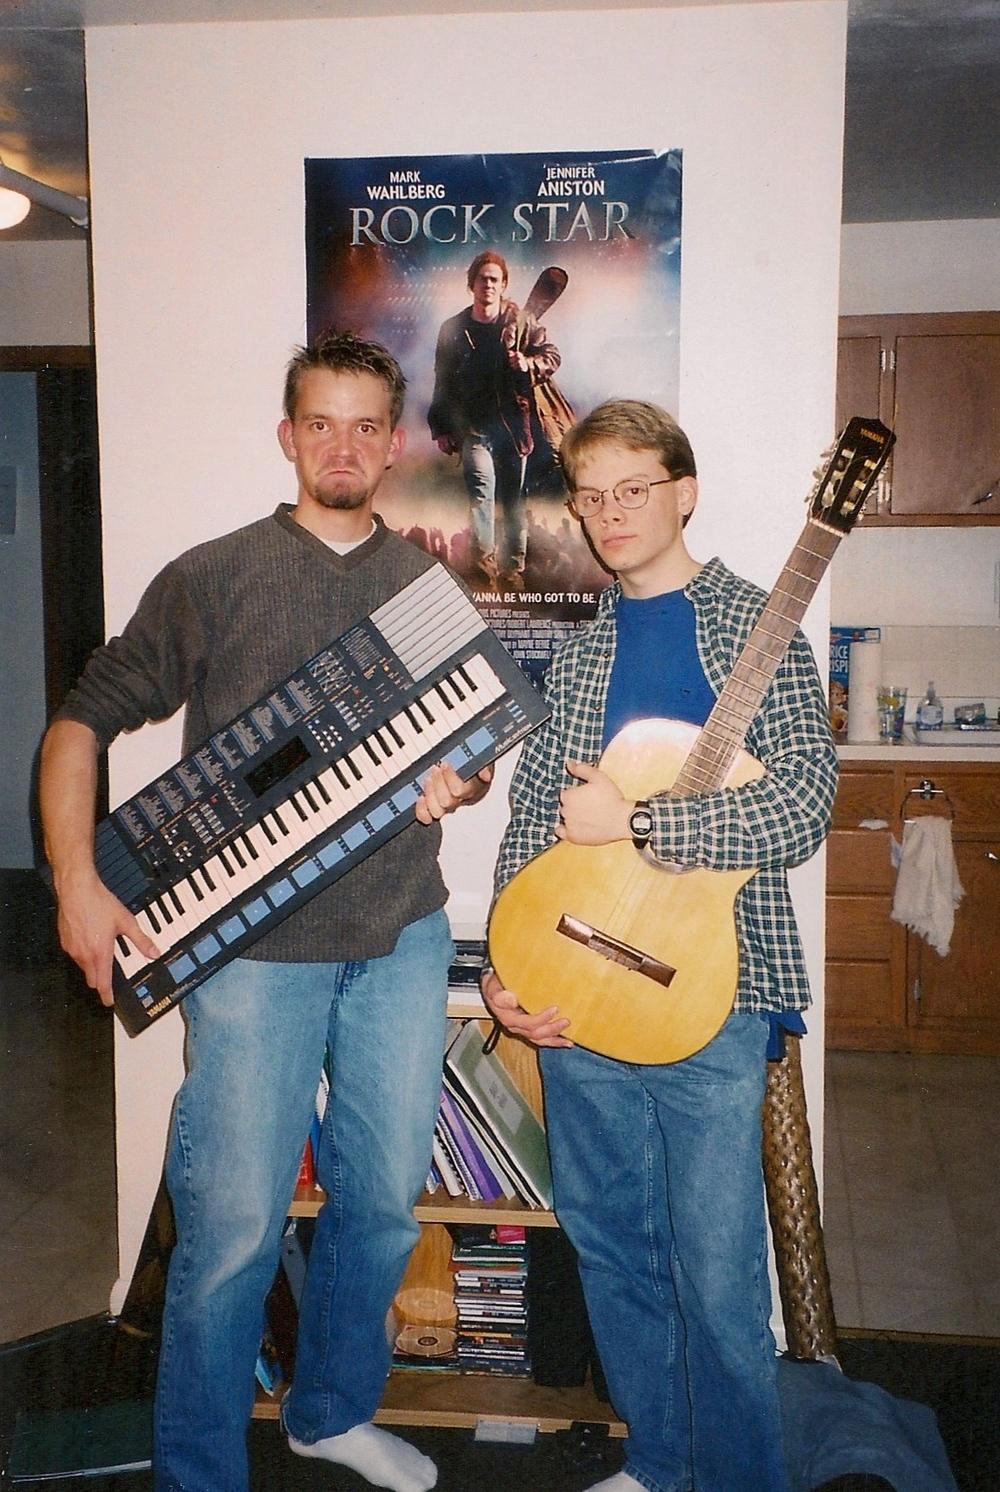 Roommates: JR, keyboard; Steve, Guitar.